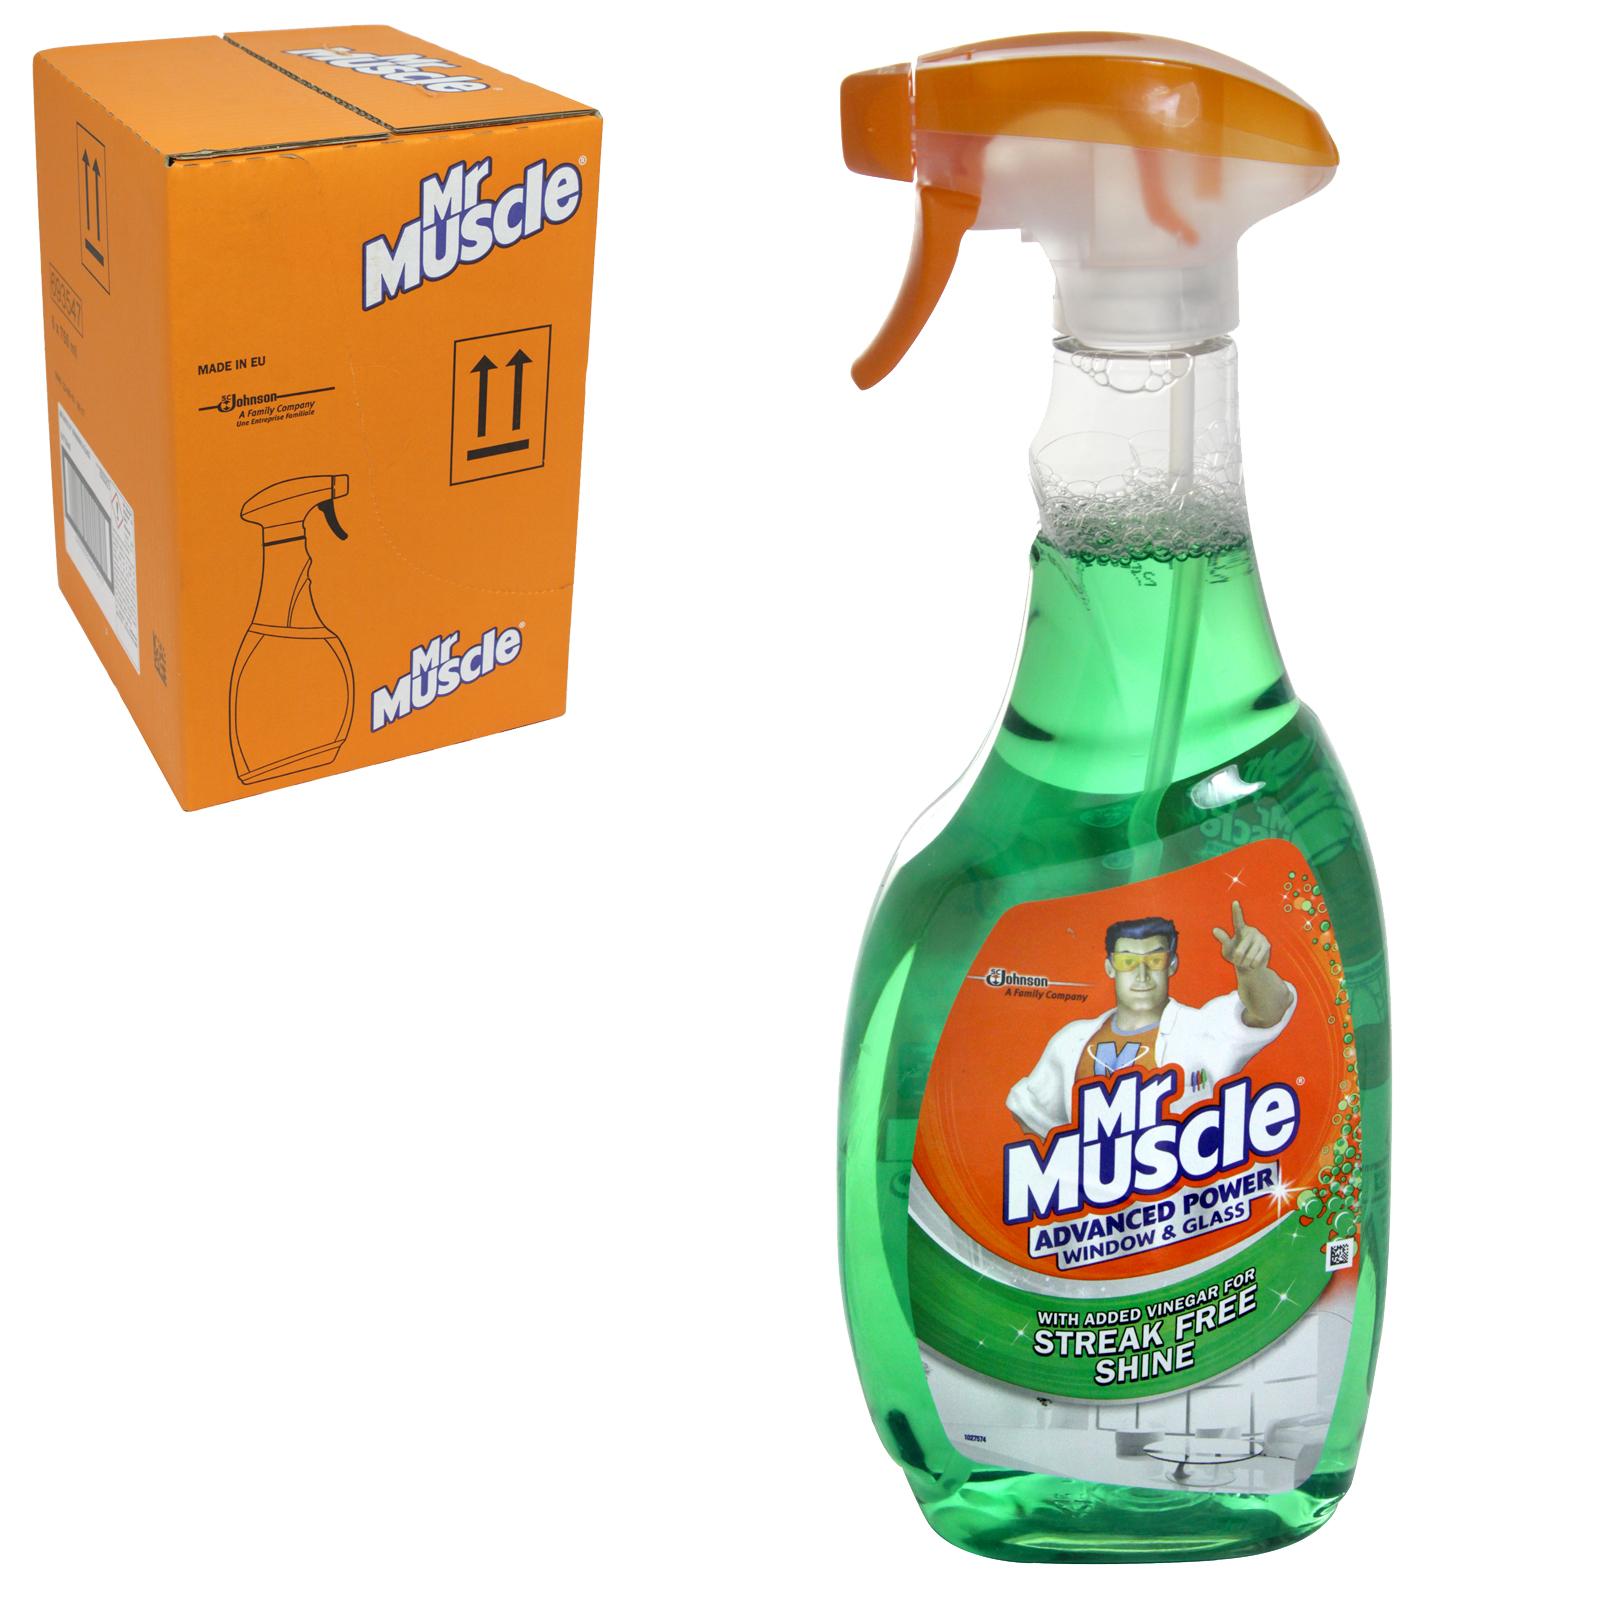 MR MUSCLE 750ML ADVANCED WINDOW & GLASS STREAK FREE SHINE X6